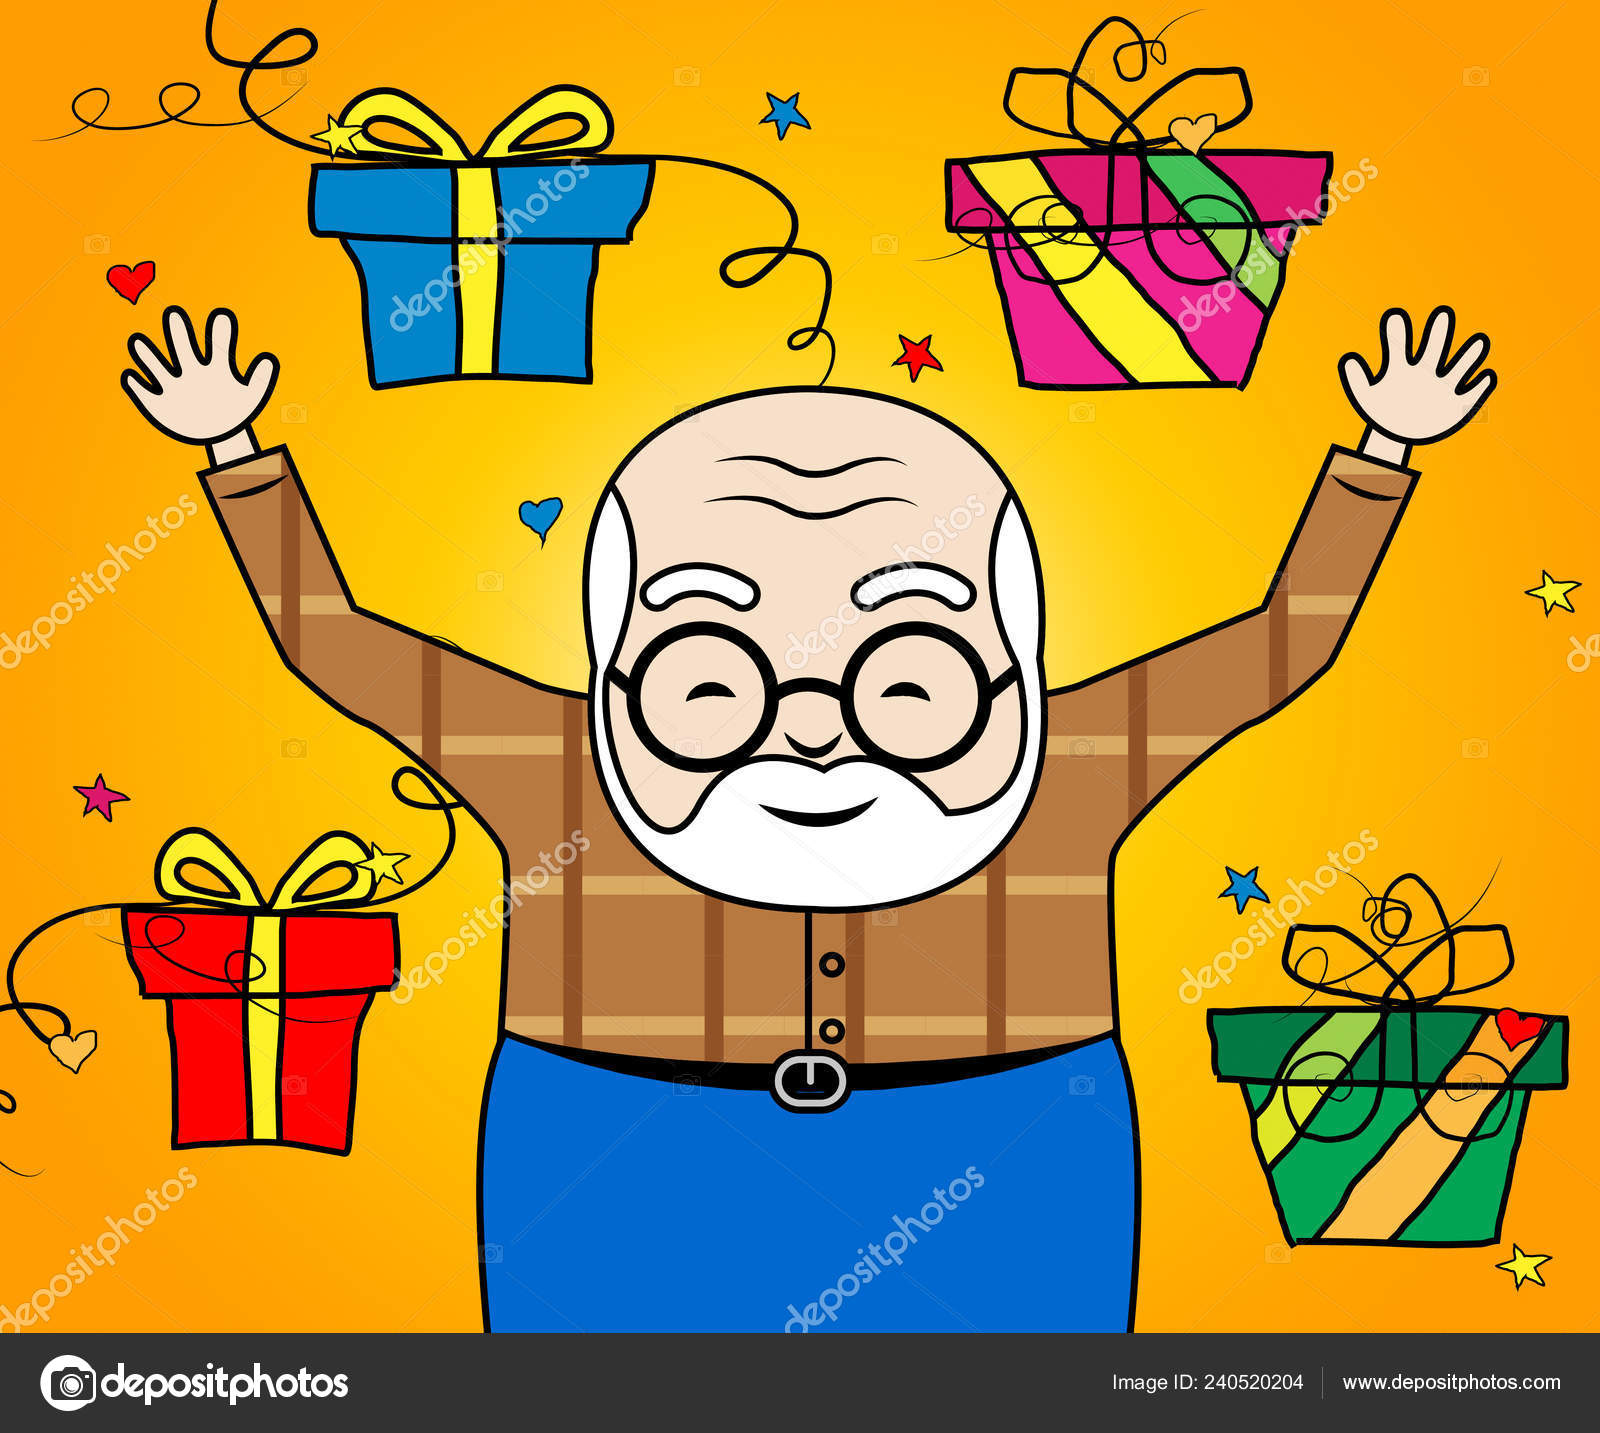 Happy Birthday Grandpa Gifts Surprise Greeting Grandad Best Wishes Grandfather Stock Photo